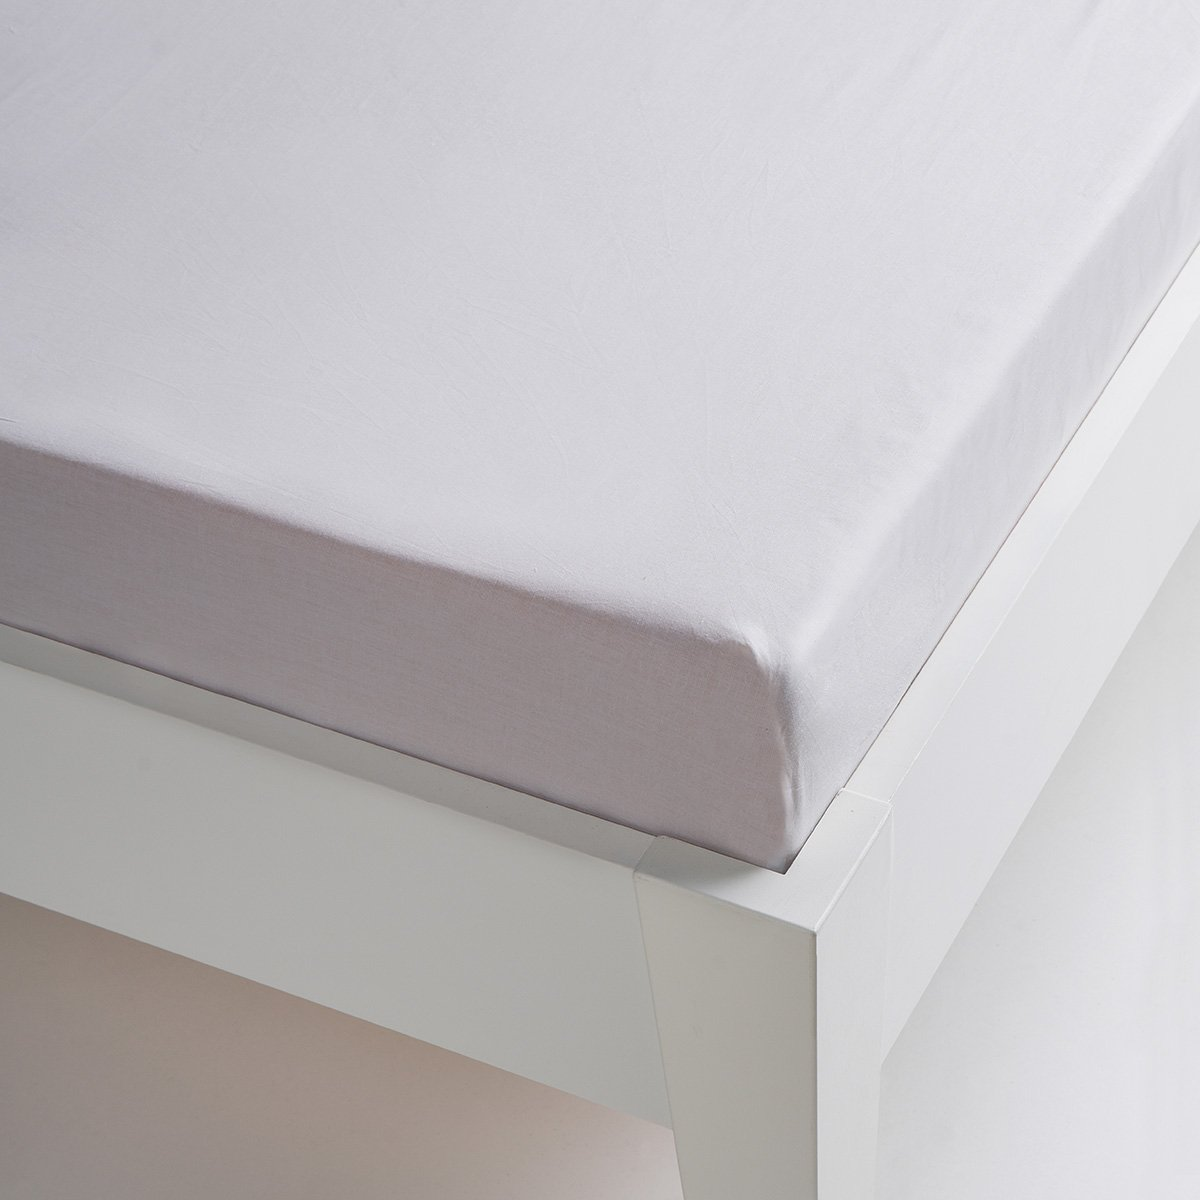 Aire Textil Sábanas HOSTELERIA - Bajera Ajustable Calidad 200 Hilos. Percal 100% algodón. Cama 135 cm: Amazon.es: Hogar